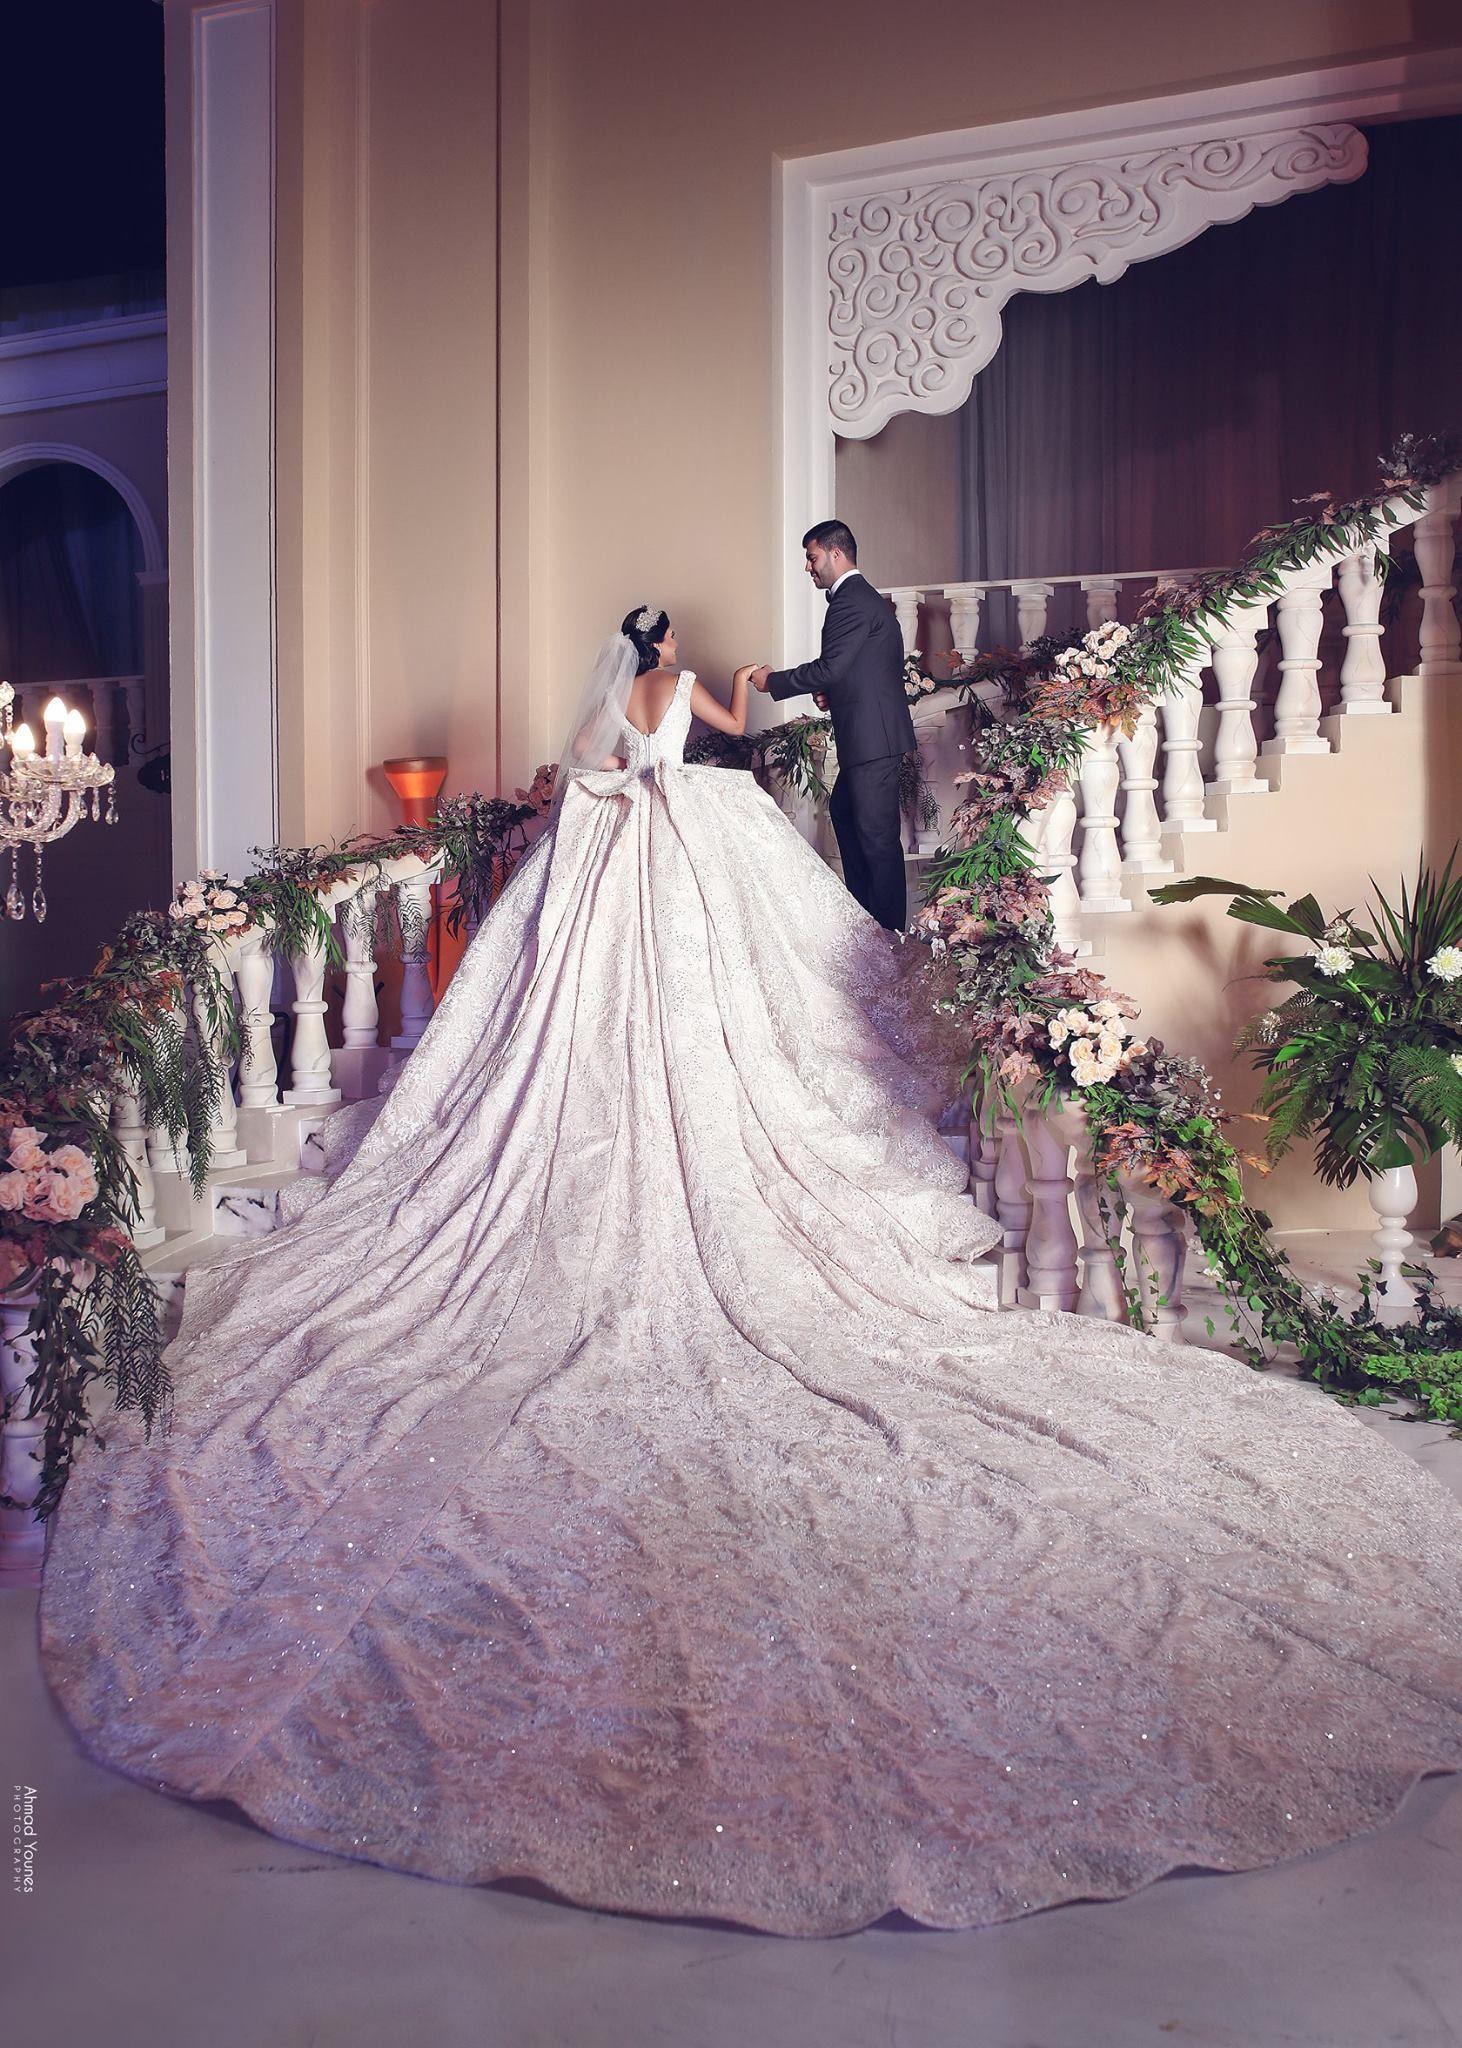 Crazy Wedding Dresses Image By Jembut Ireng Dream Wedding